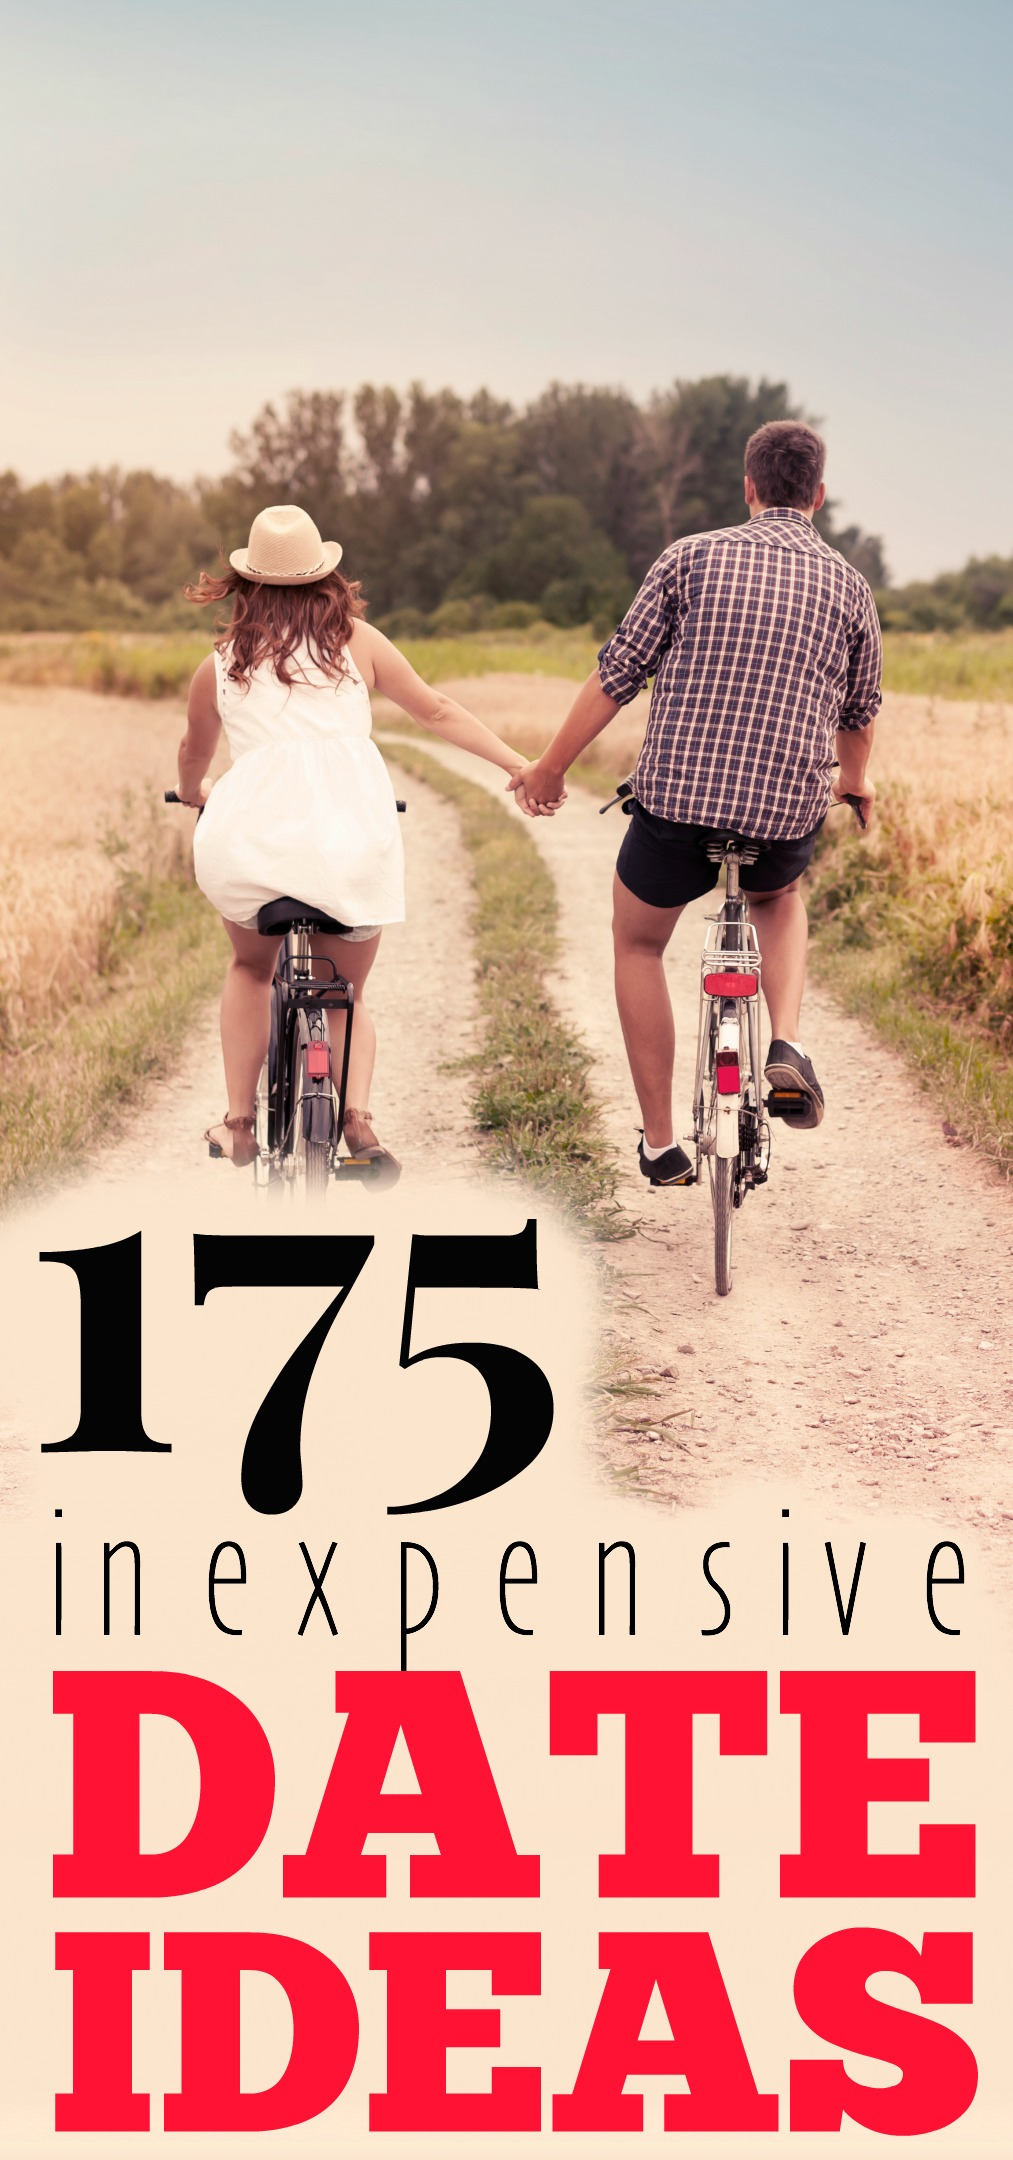 Bucket List! 175 Inexpensive Date Ideas